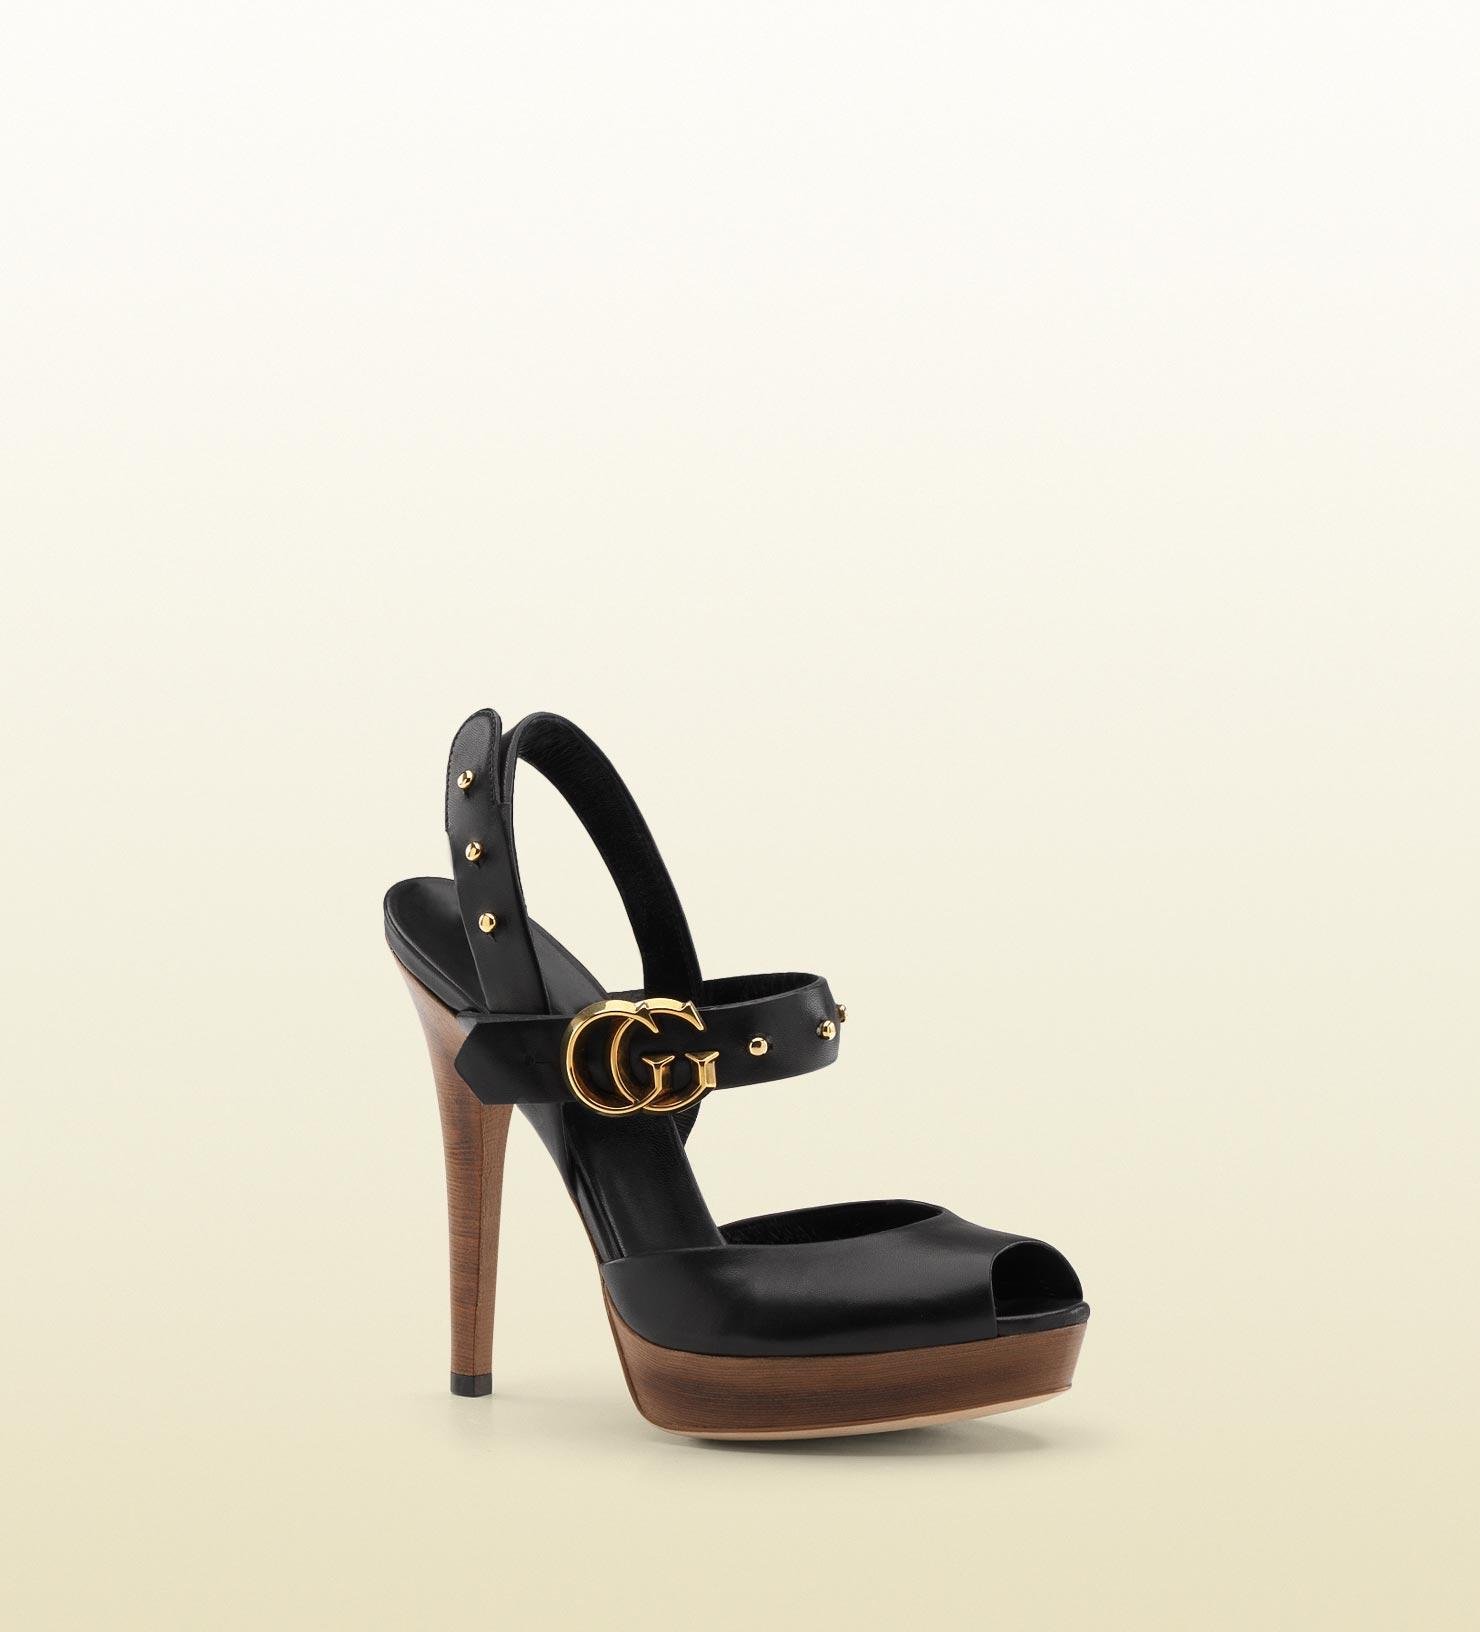 e409fd80b Gucci Gg Running Double G Slingback High Heel Platform Sandal in ...